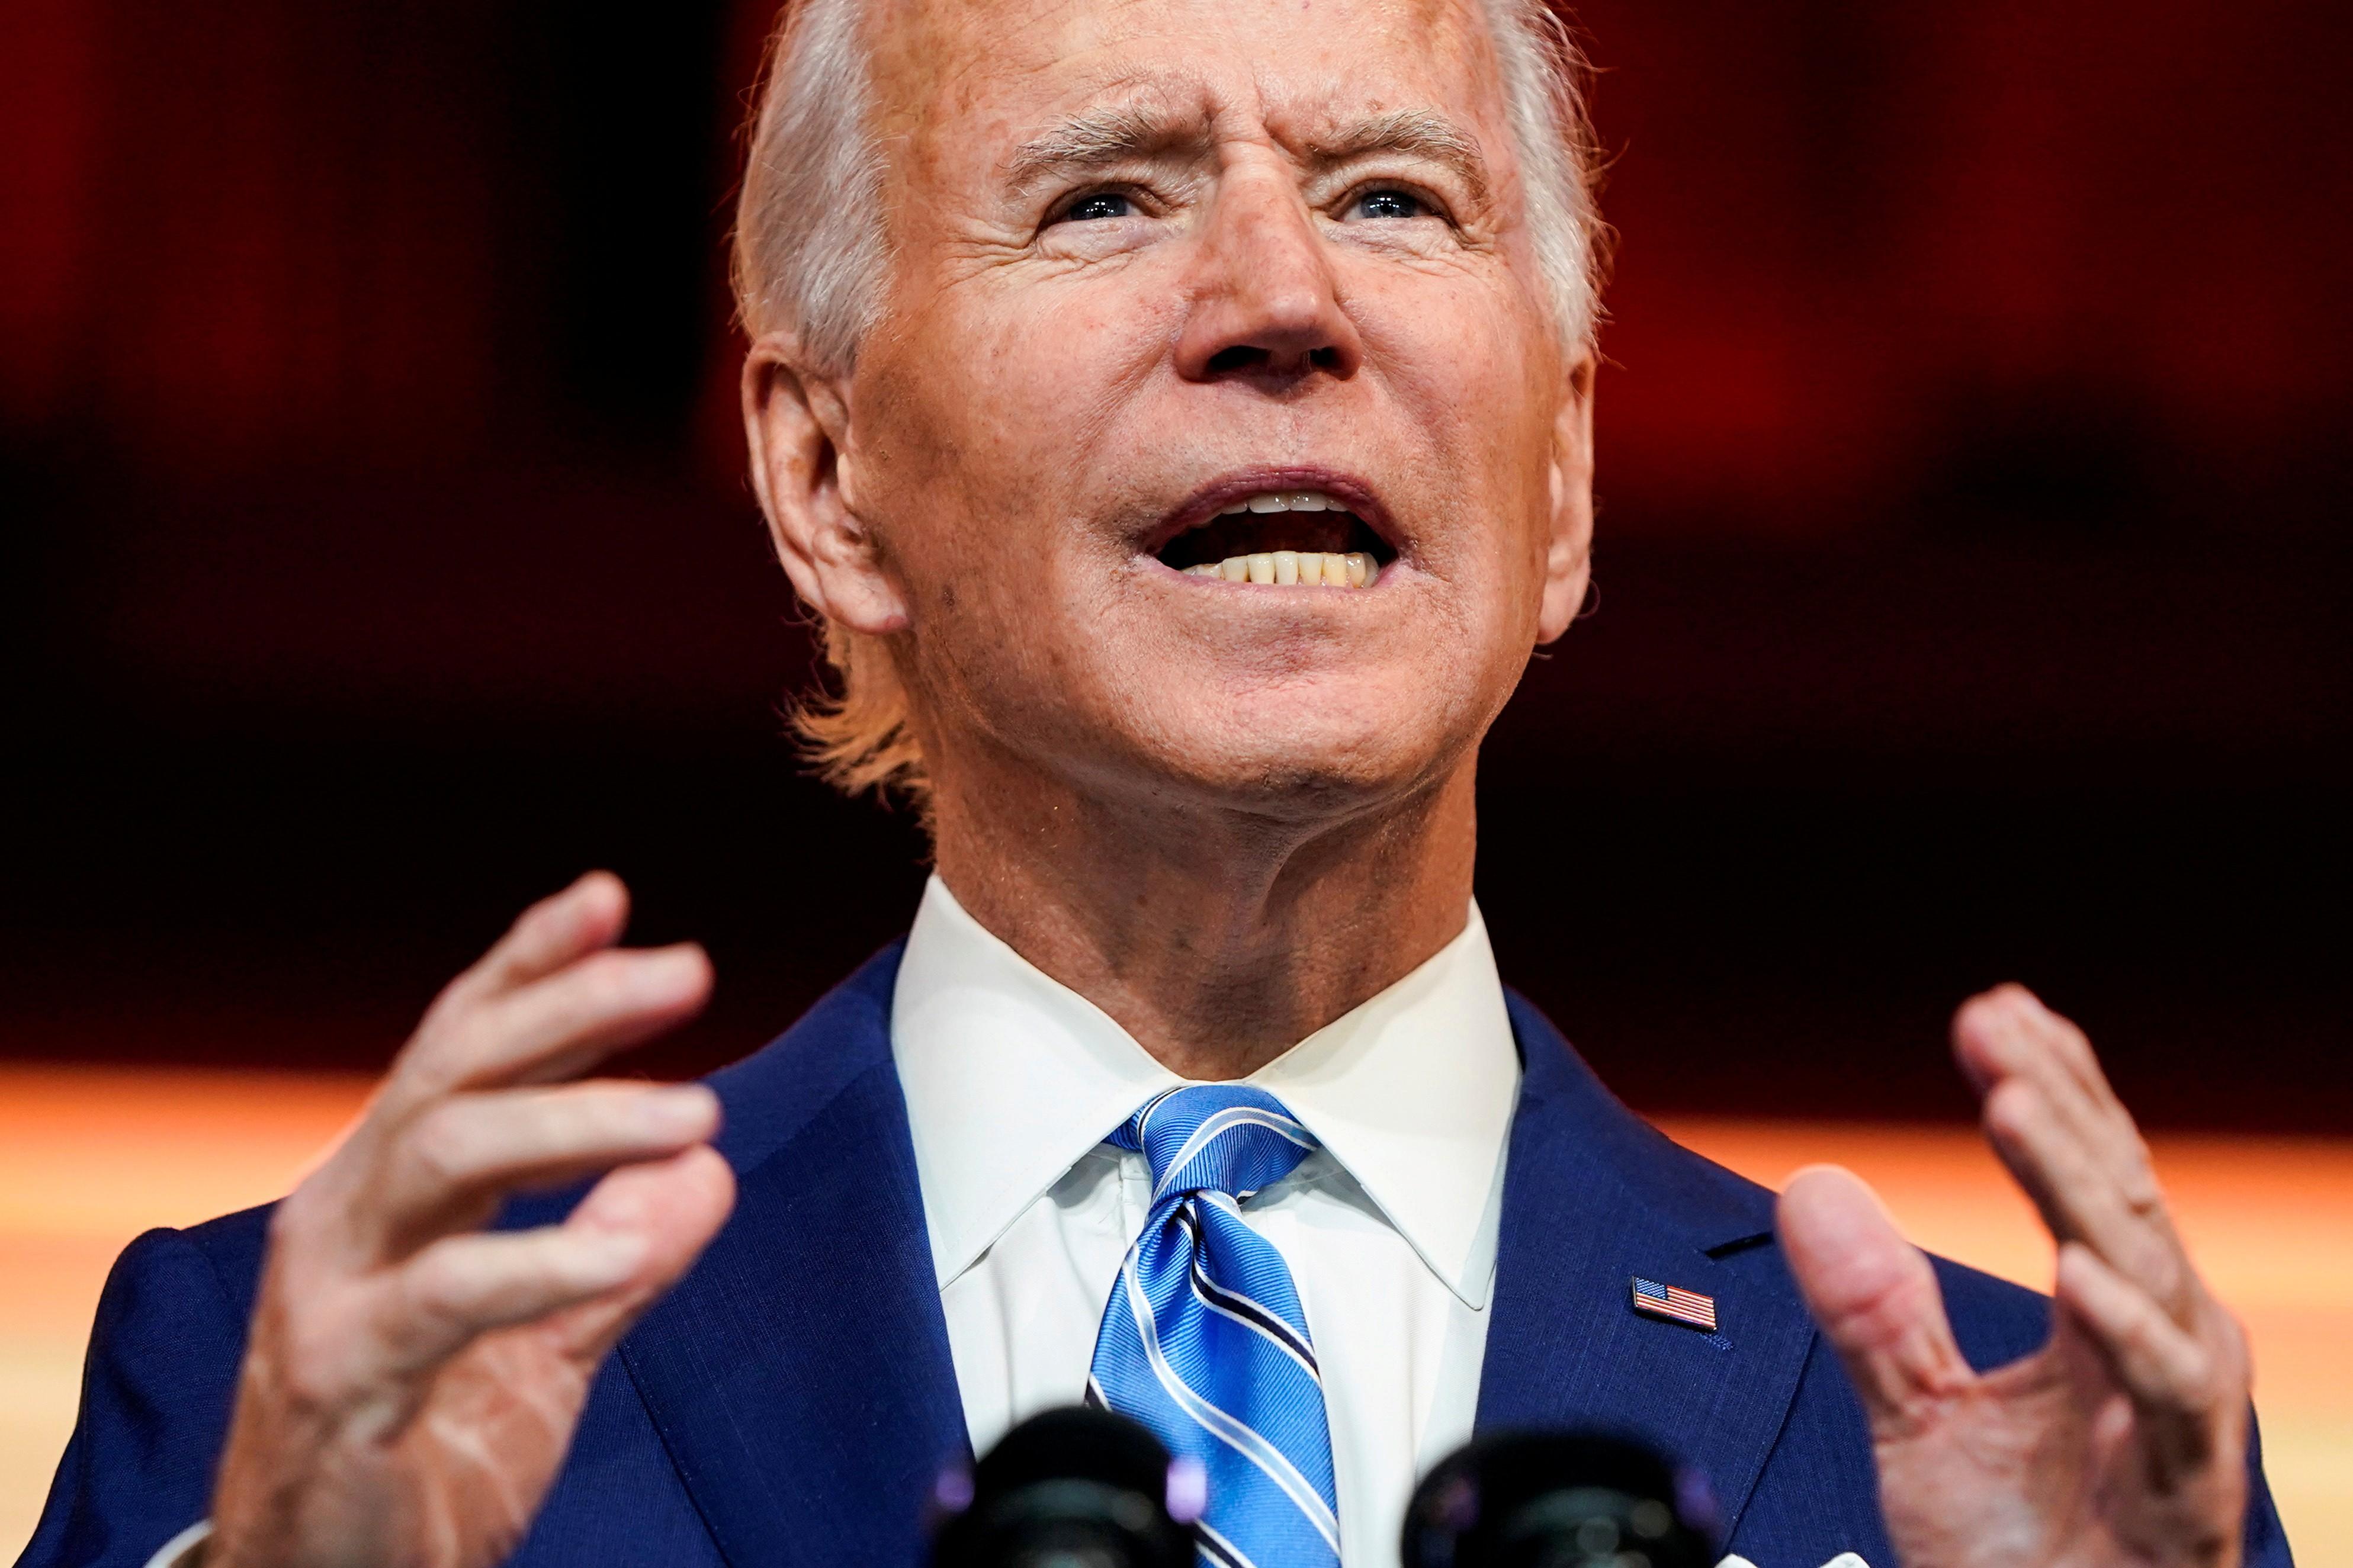 Arizona certifica vitória de Joe Biden no estado